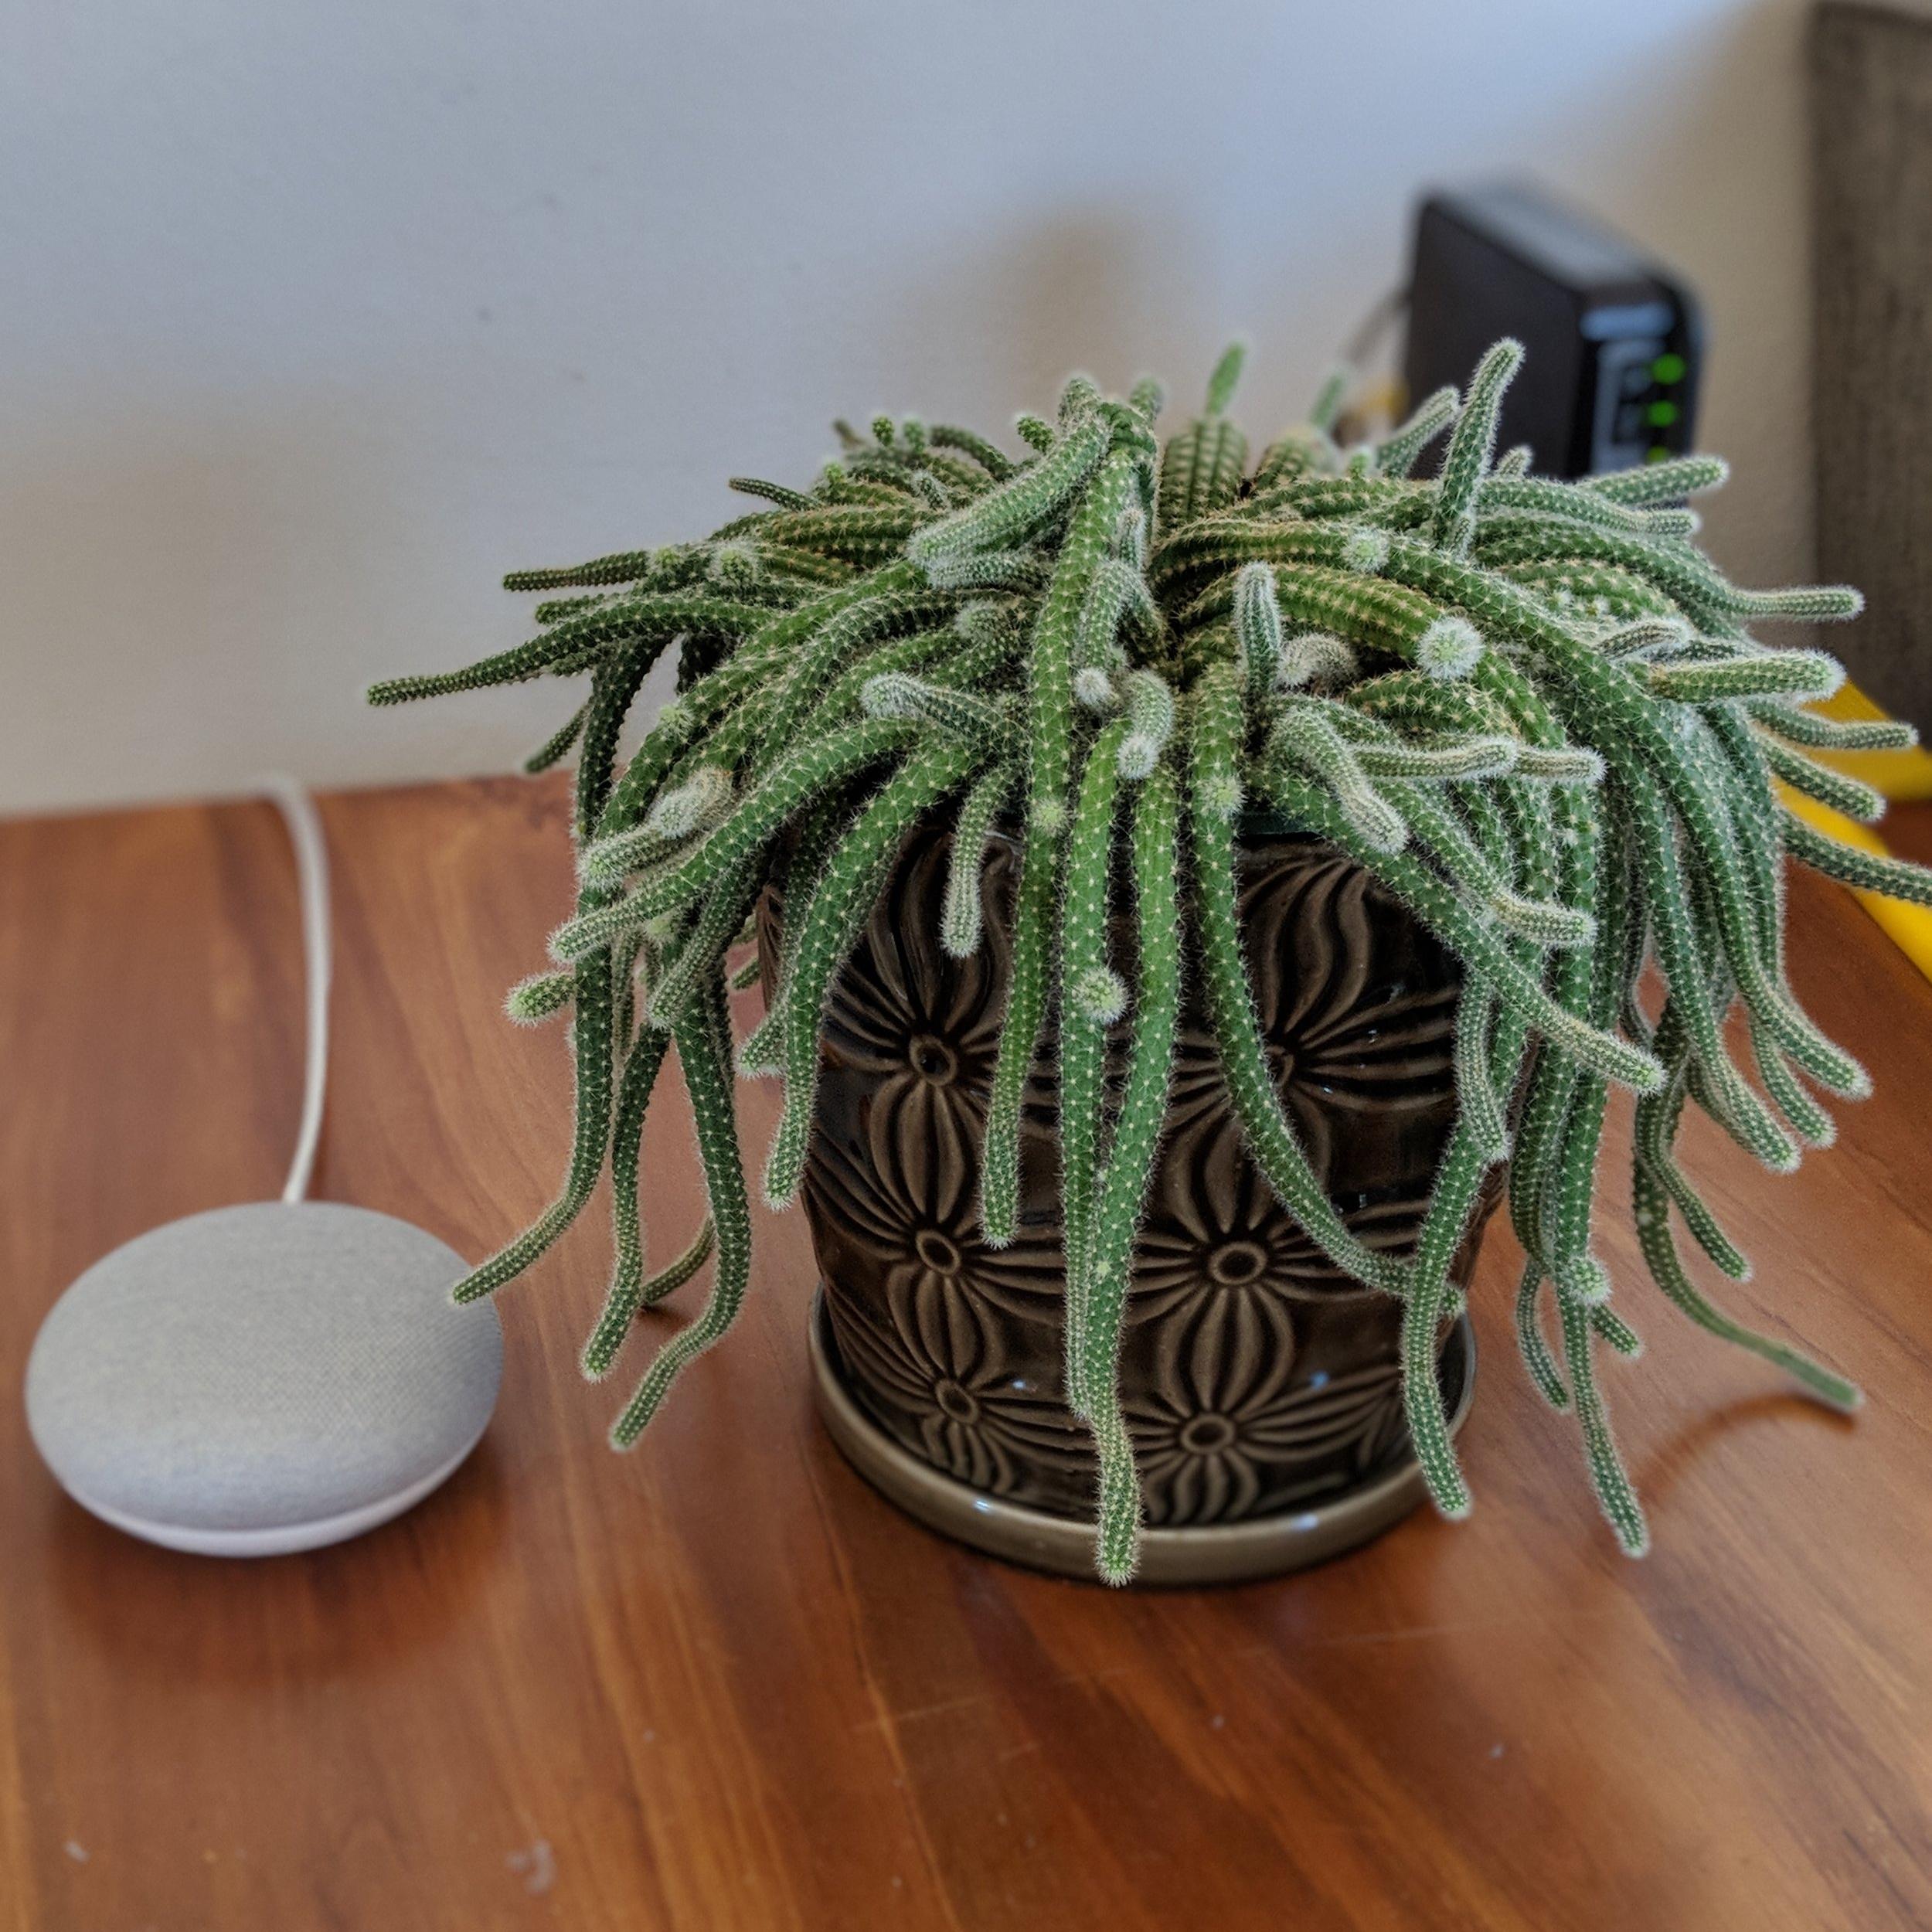 Google Home Mini and Cactus Marley